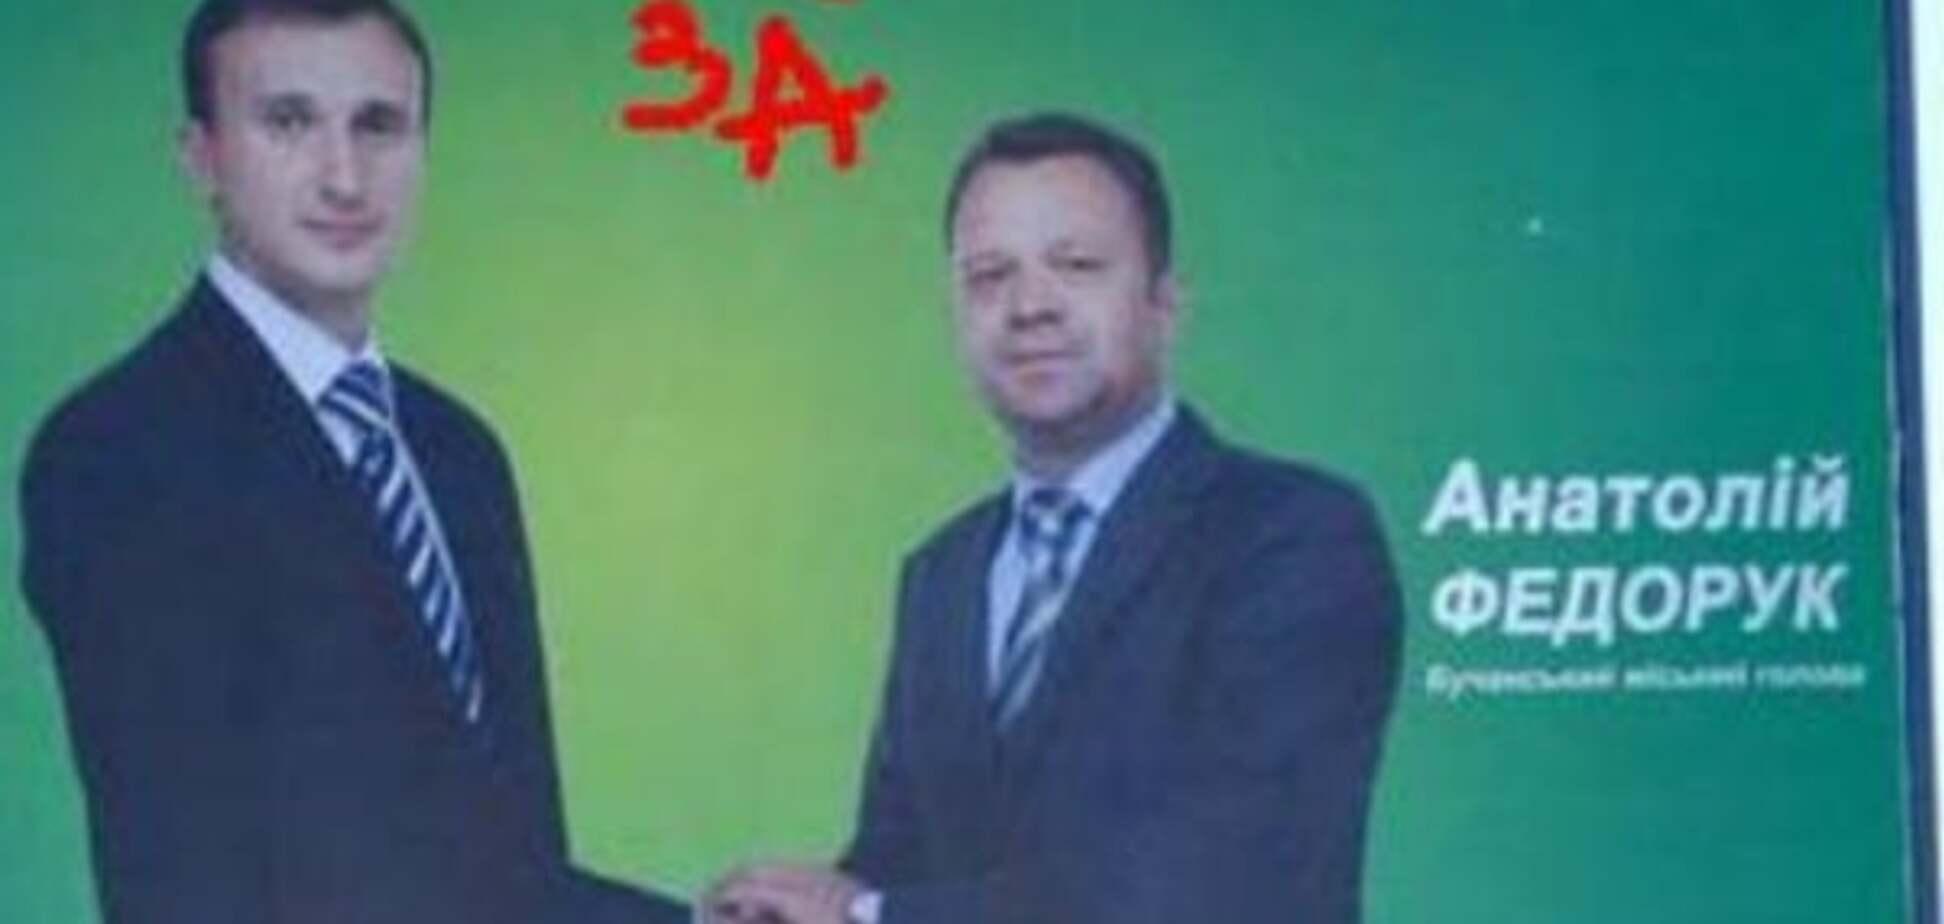 Владимир Карплюк и Анатолий Федорук